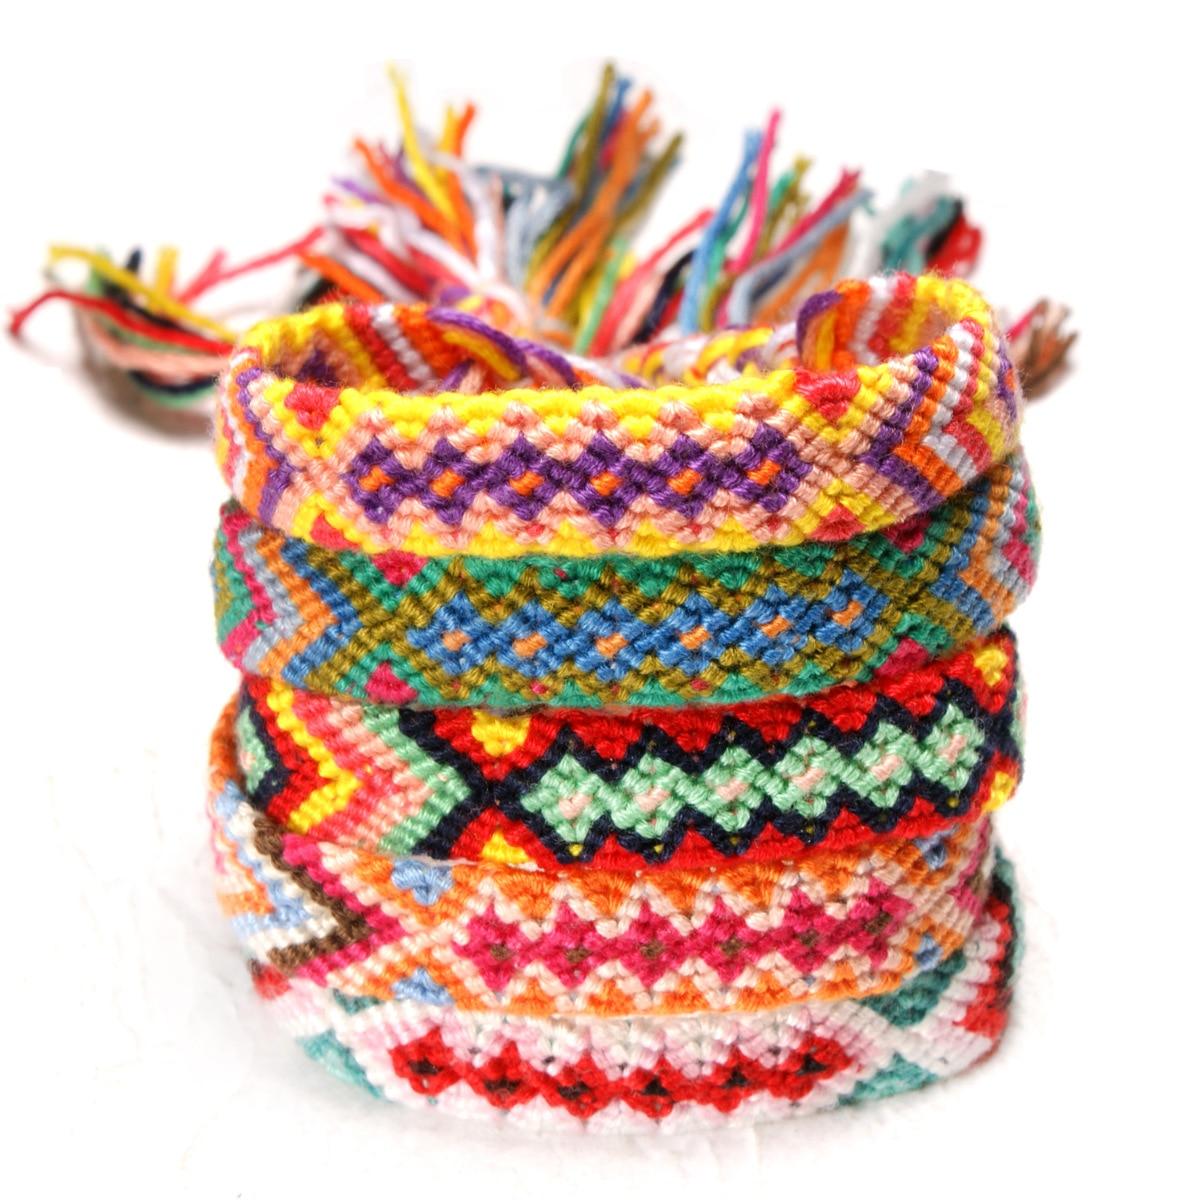 New Boho Rainbow Braided Plaited Ribbon Bracelet Geometric Pattern Cotton Rope Chain Friendship Bangles Handmade Woven Jewelry